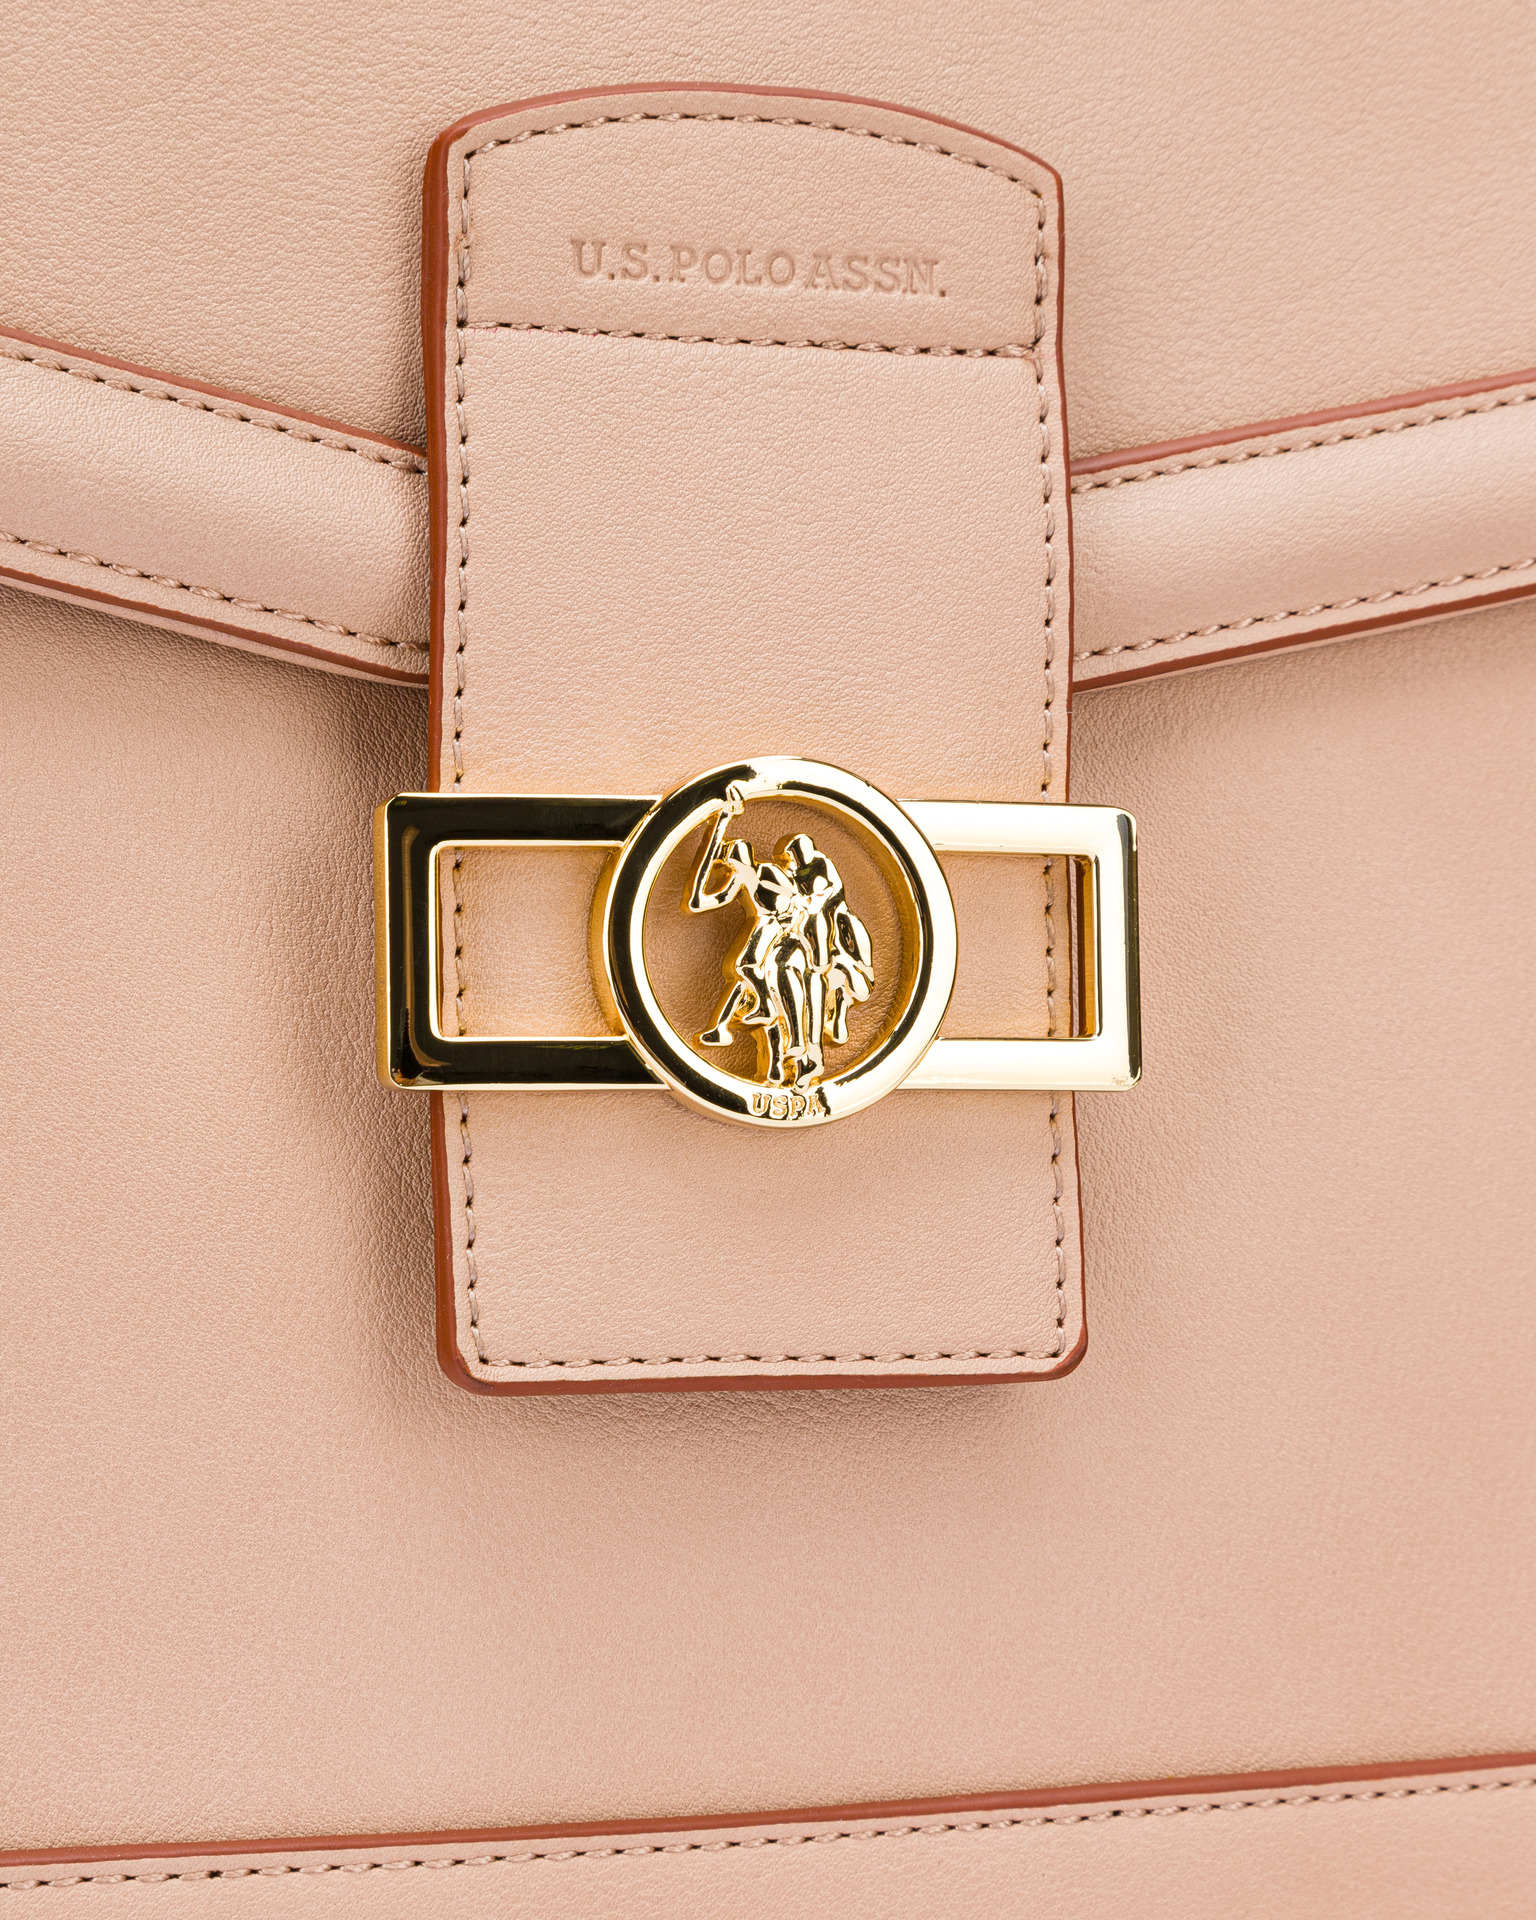 U.S. Polo Assn. Borsetta donna beige  Flap